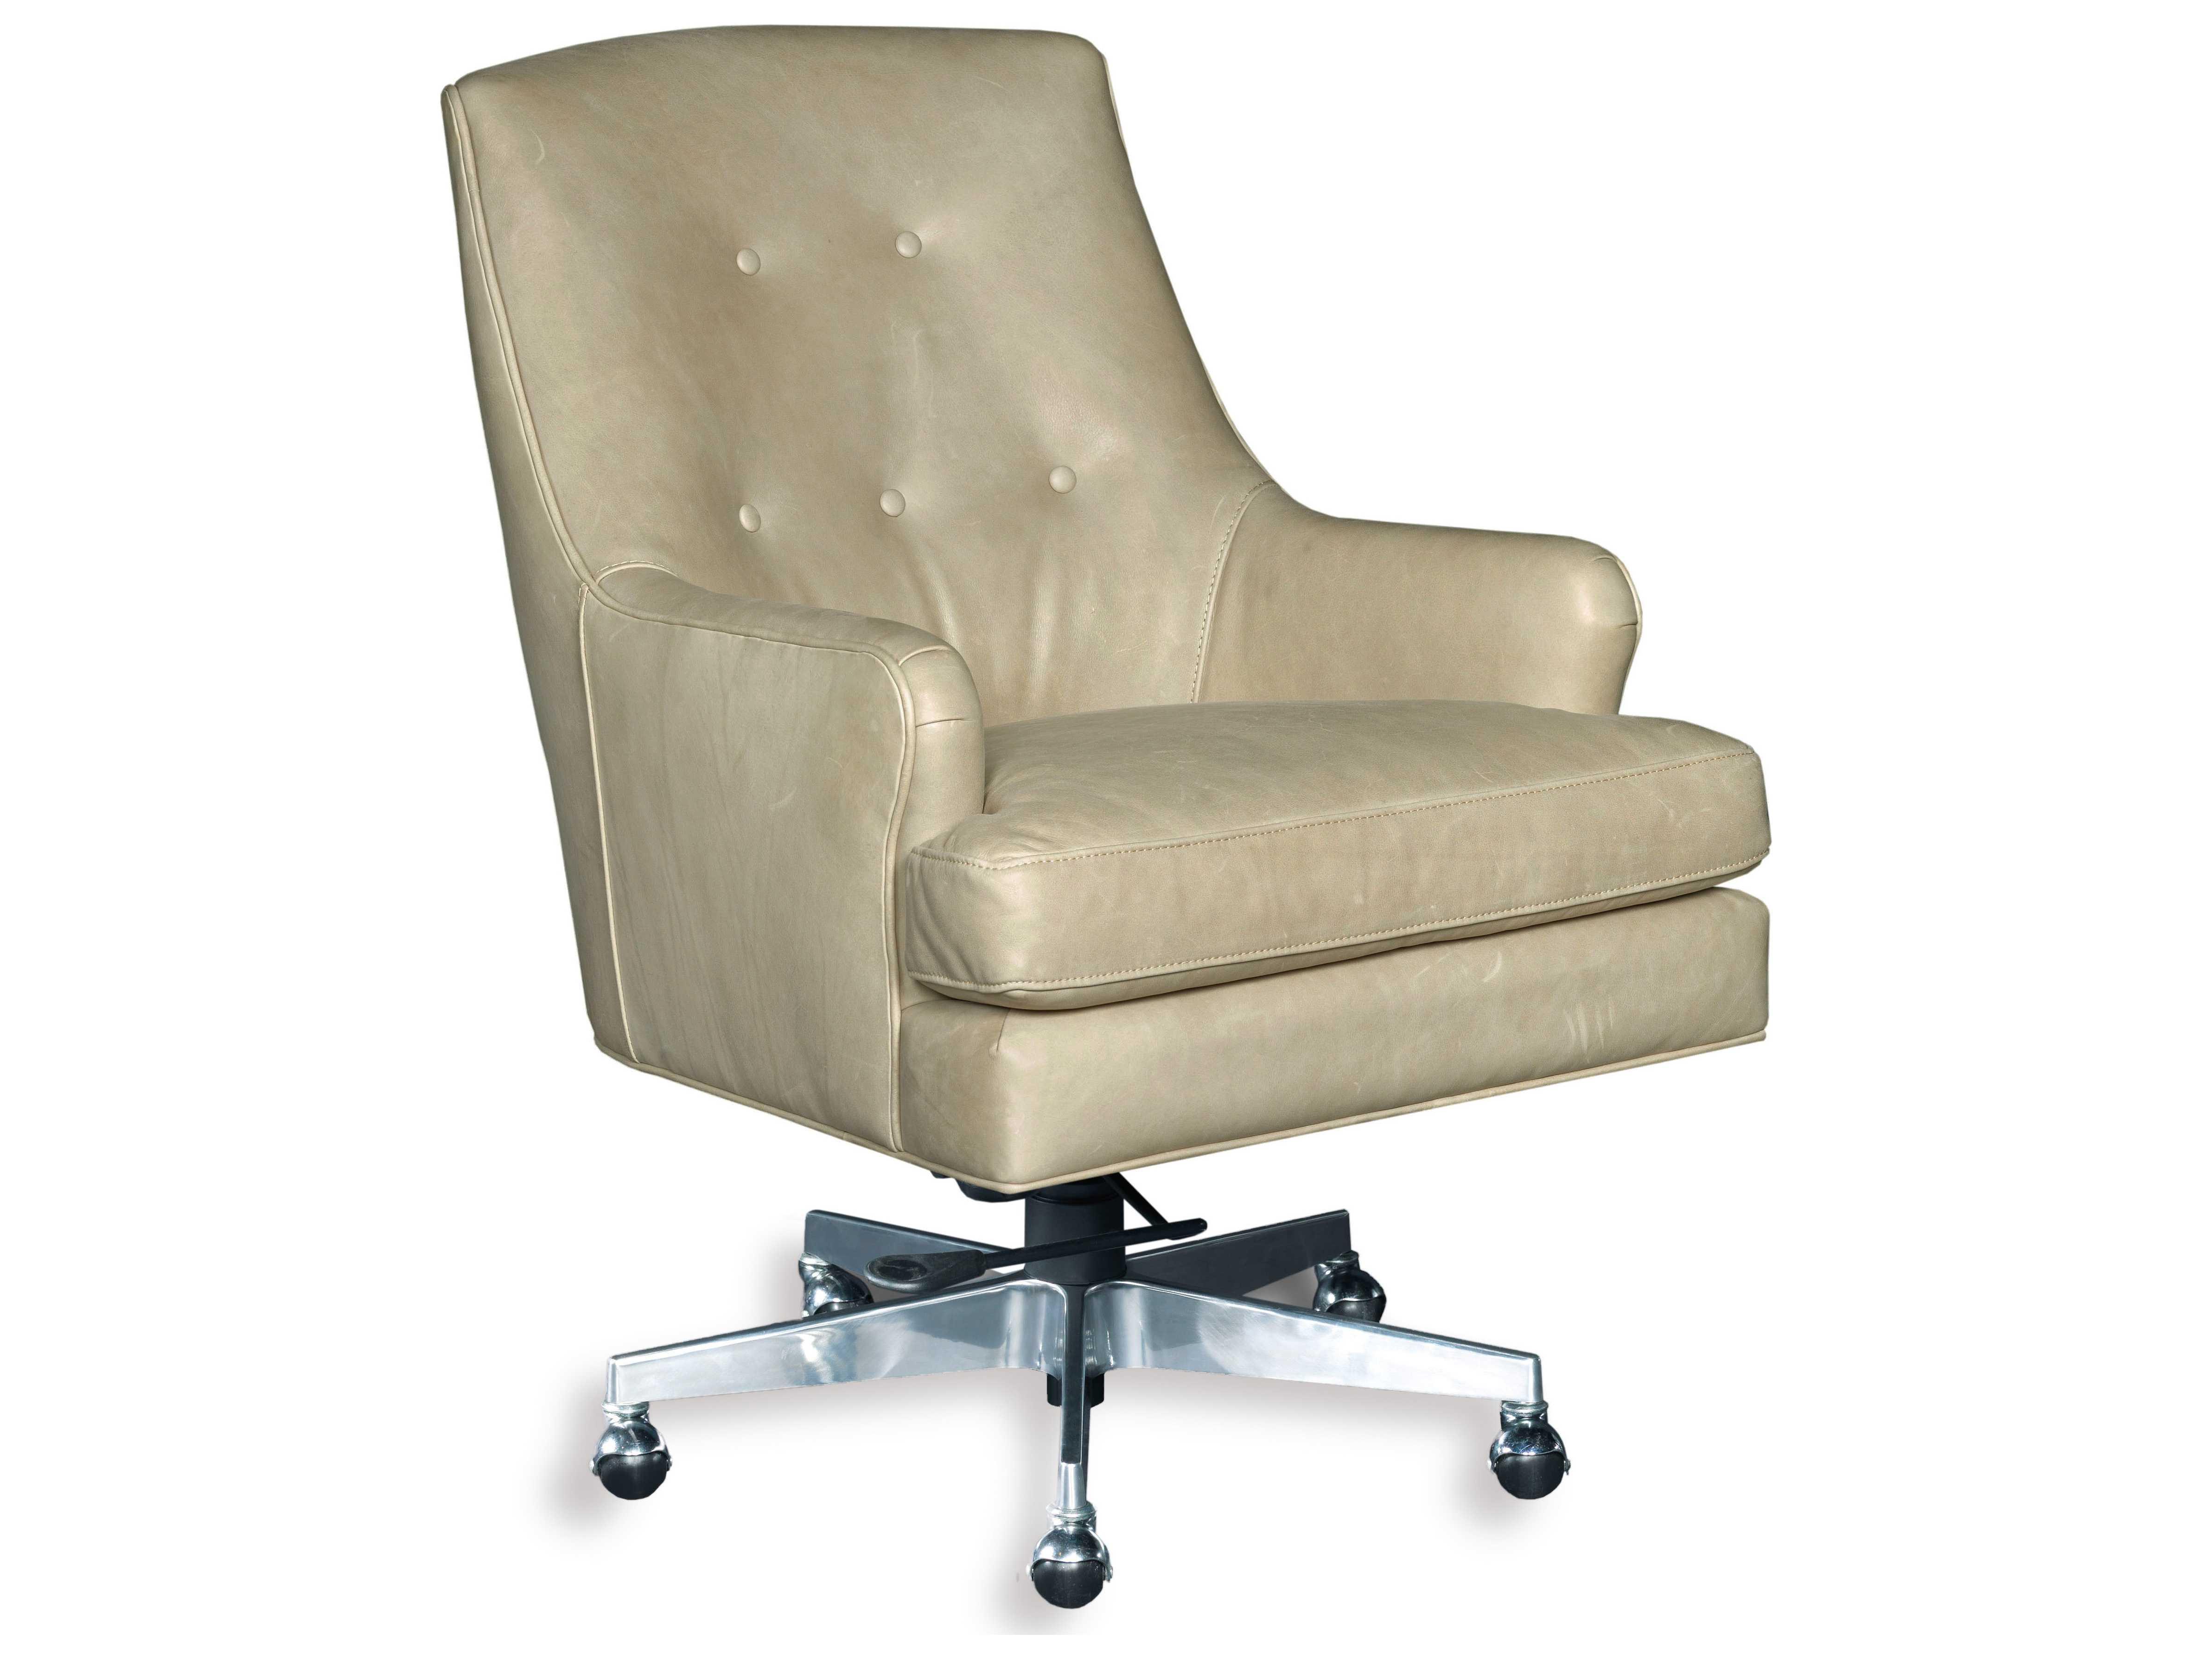 hooker furniture viewpoint home office set hoo532810436set2